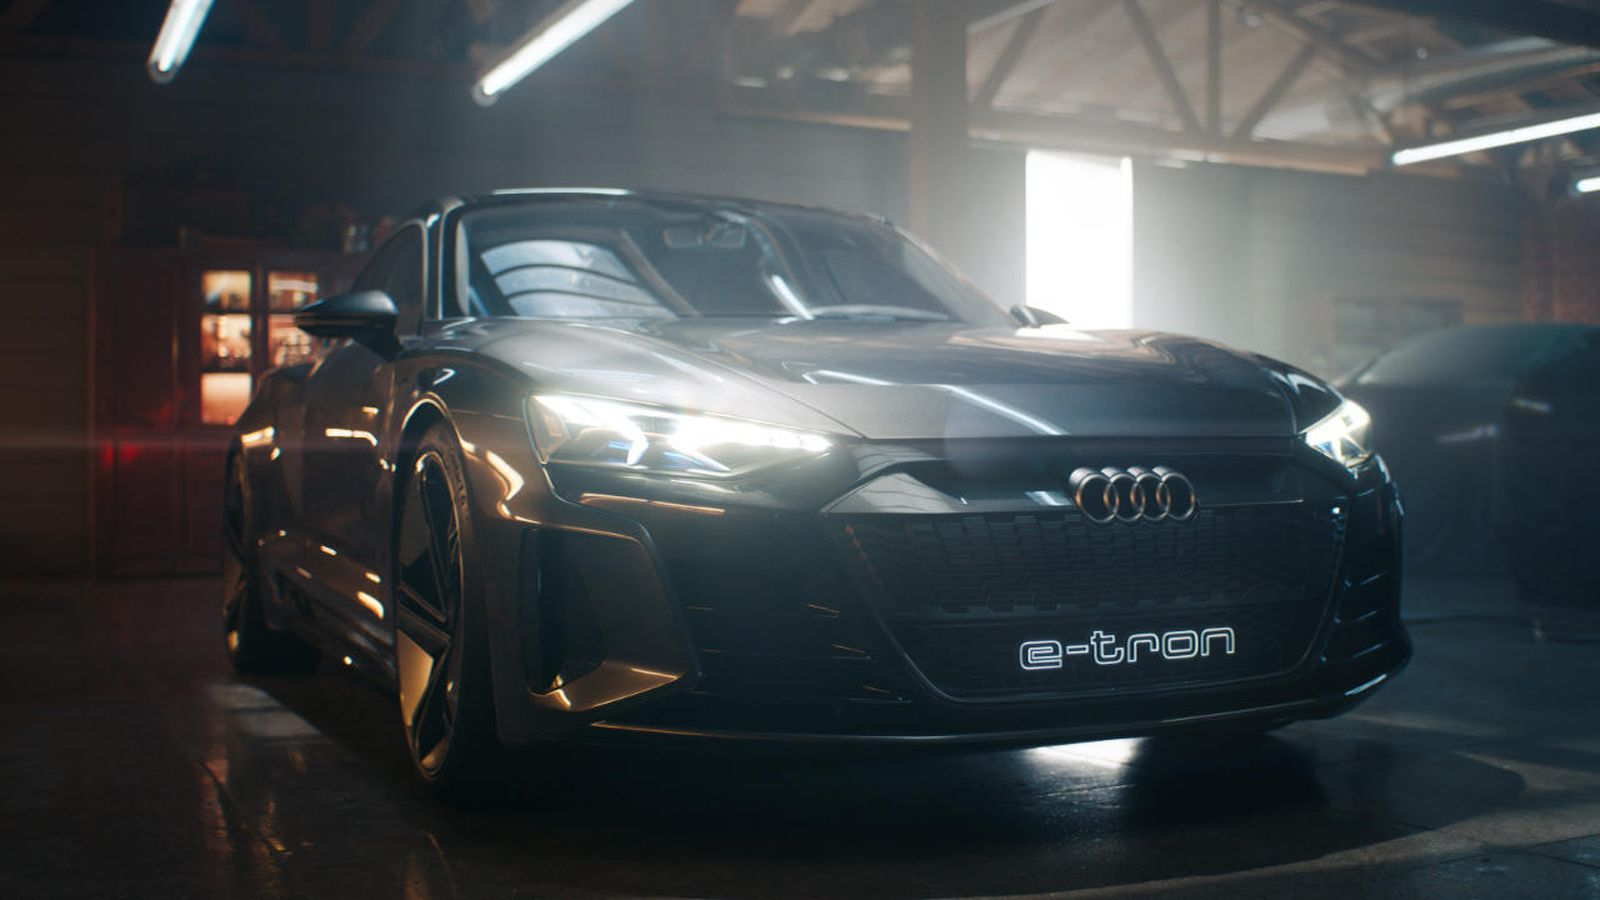 audi e-tron EV concept car super bowl ad